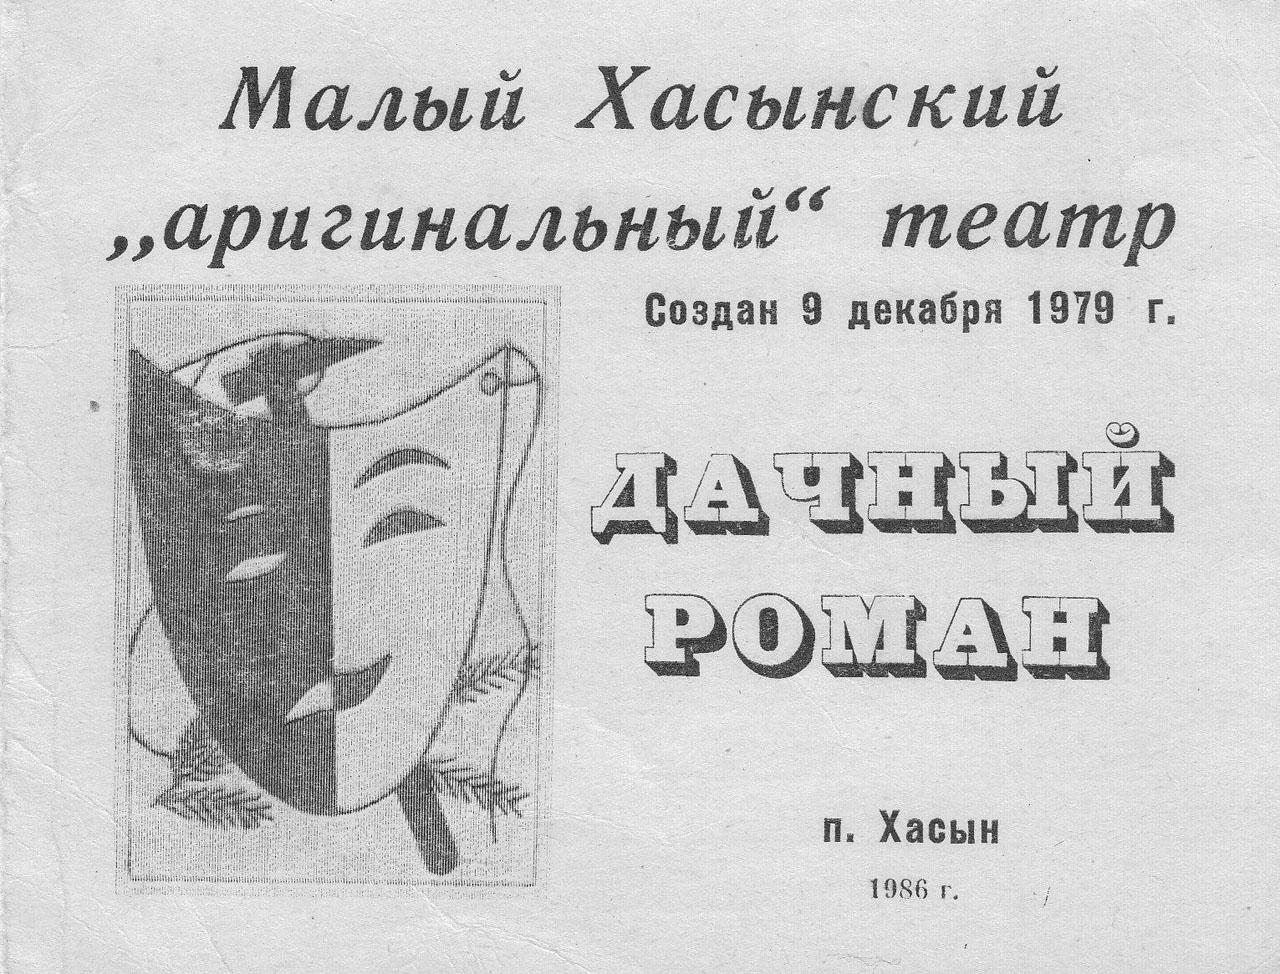 Программа спектакля Хасынского театра.